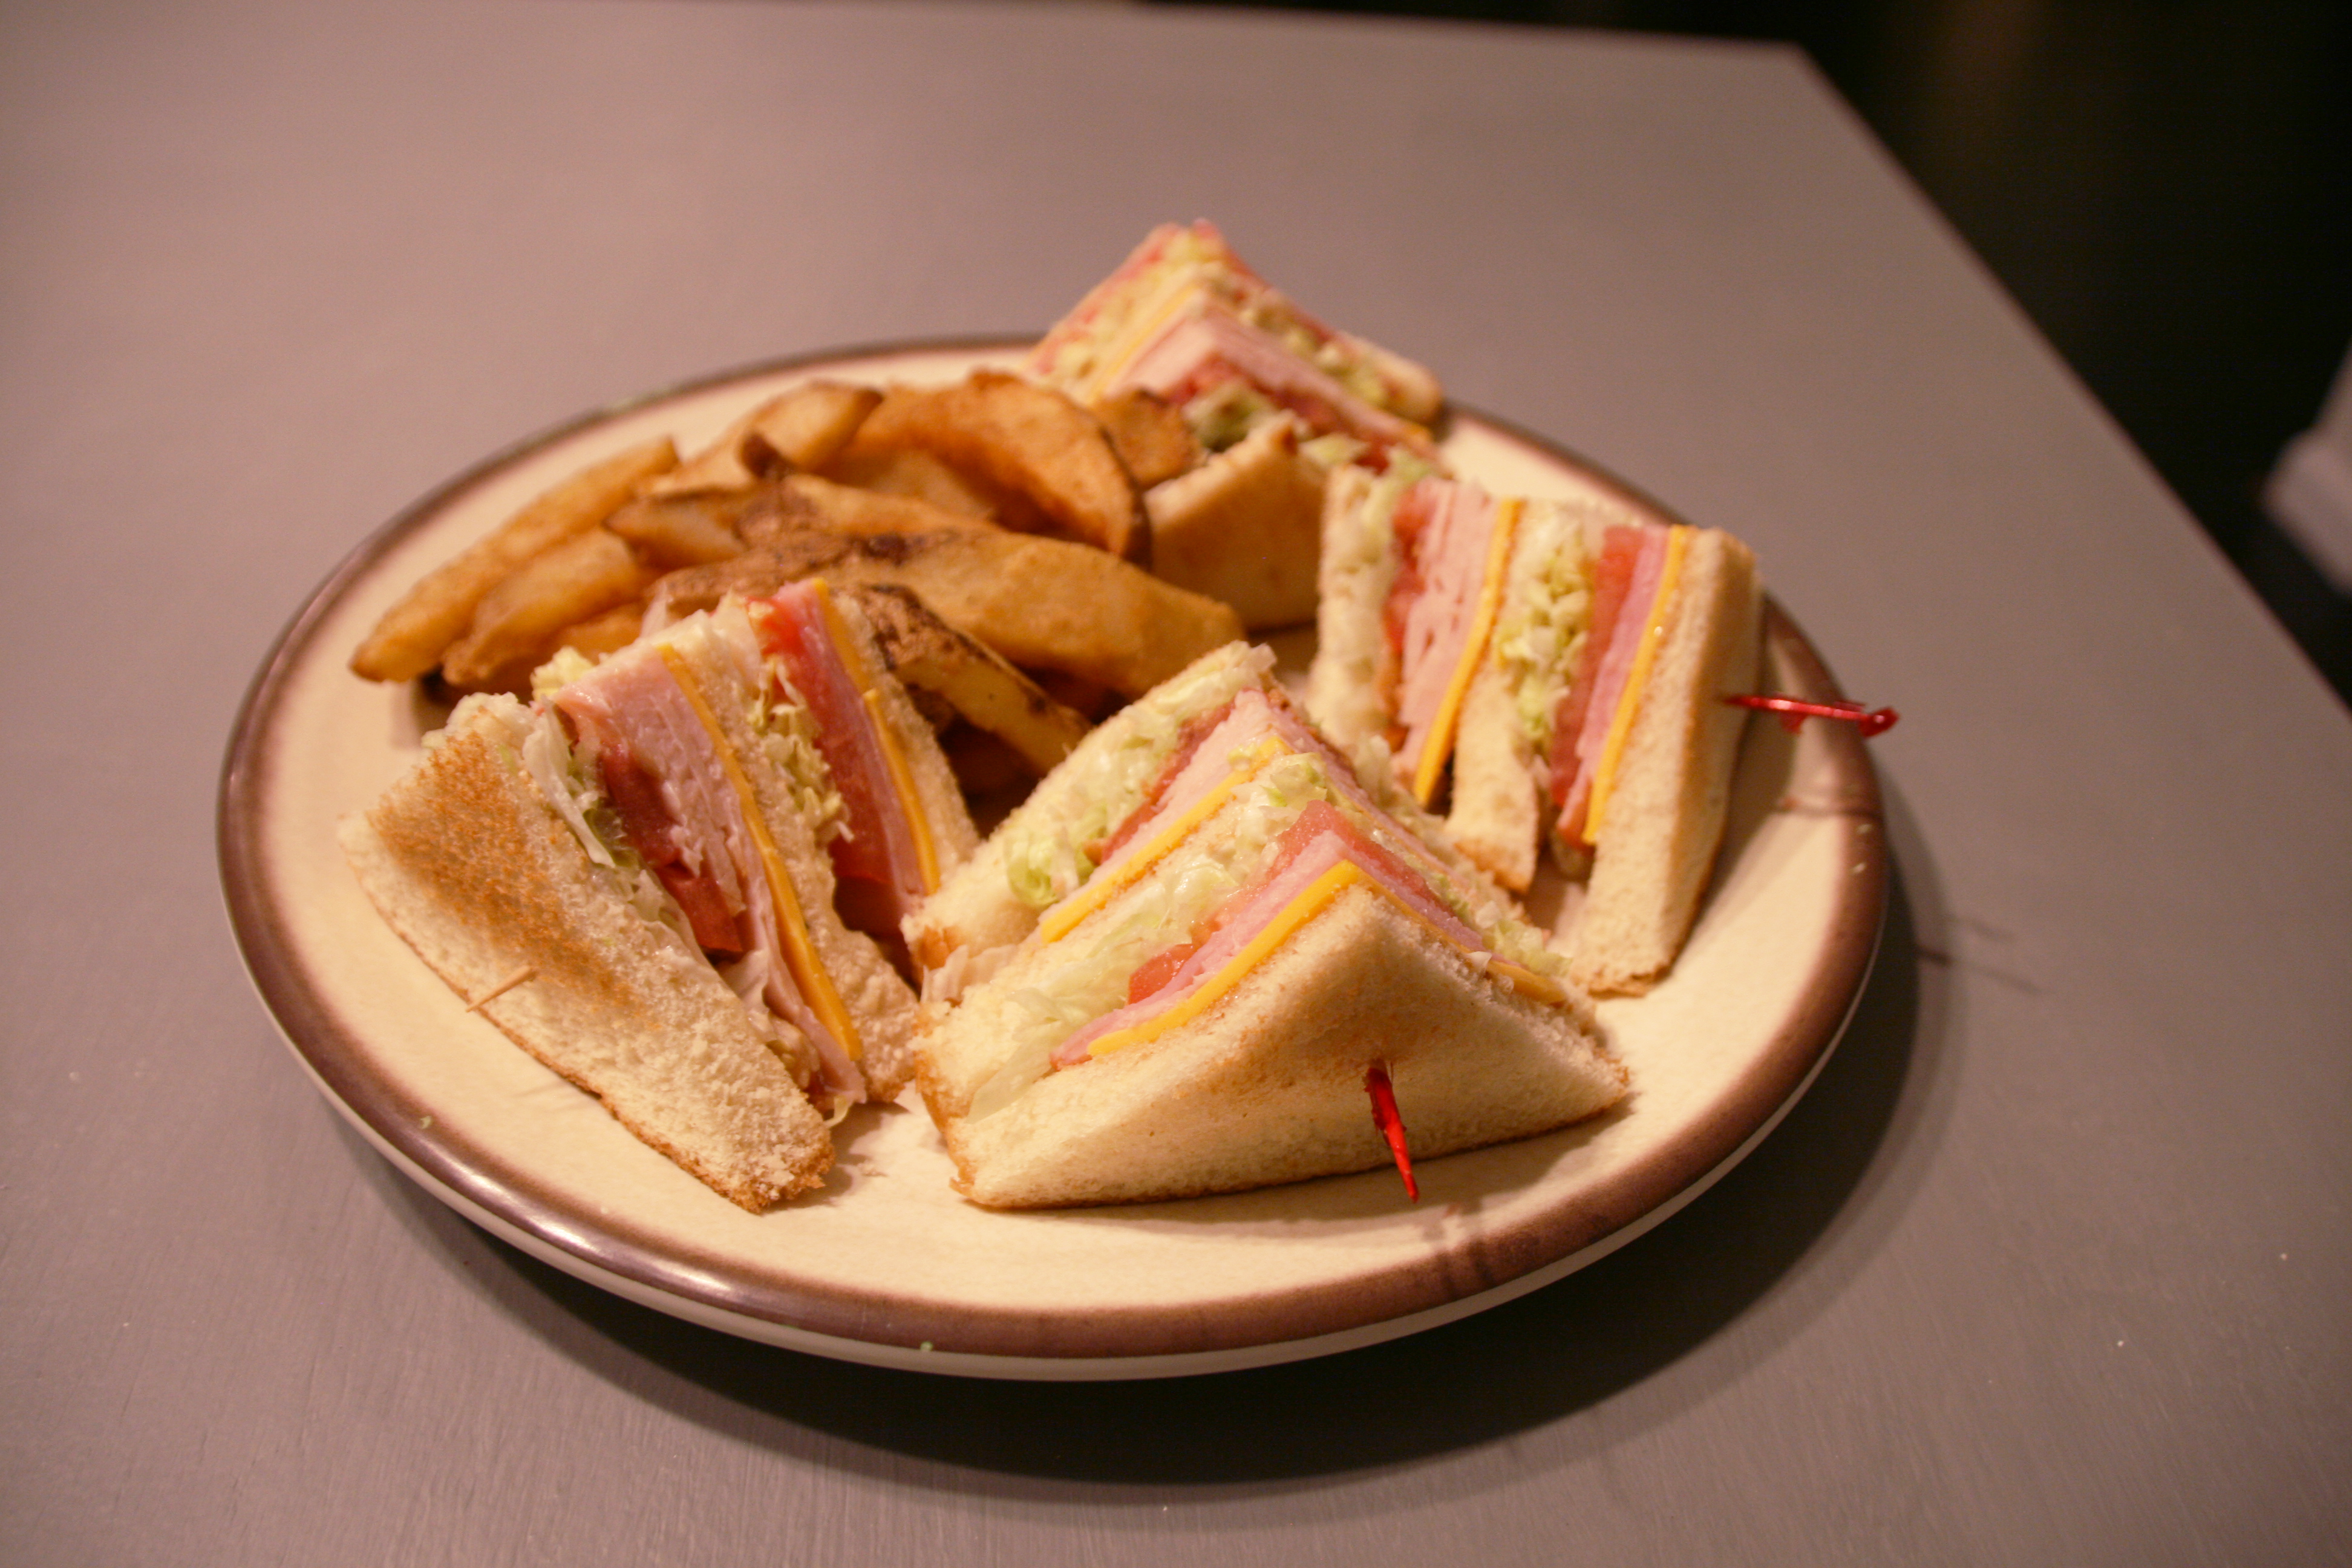 Sandwich_Edited